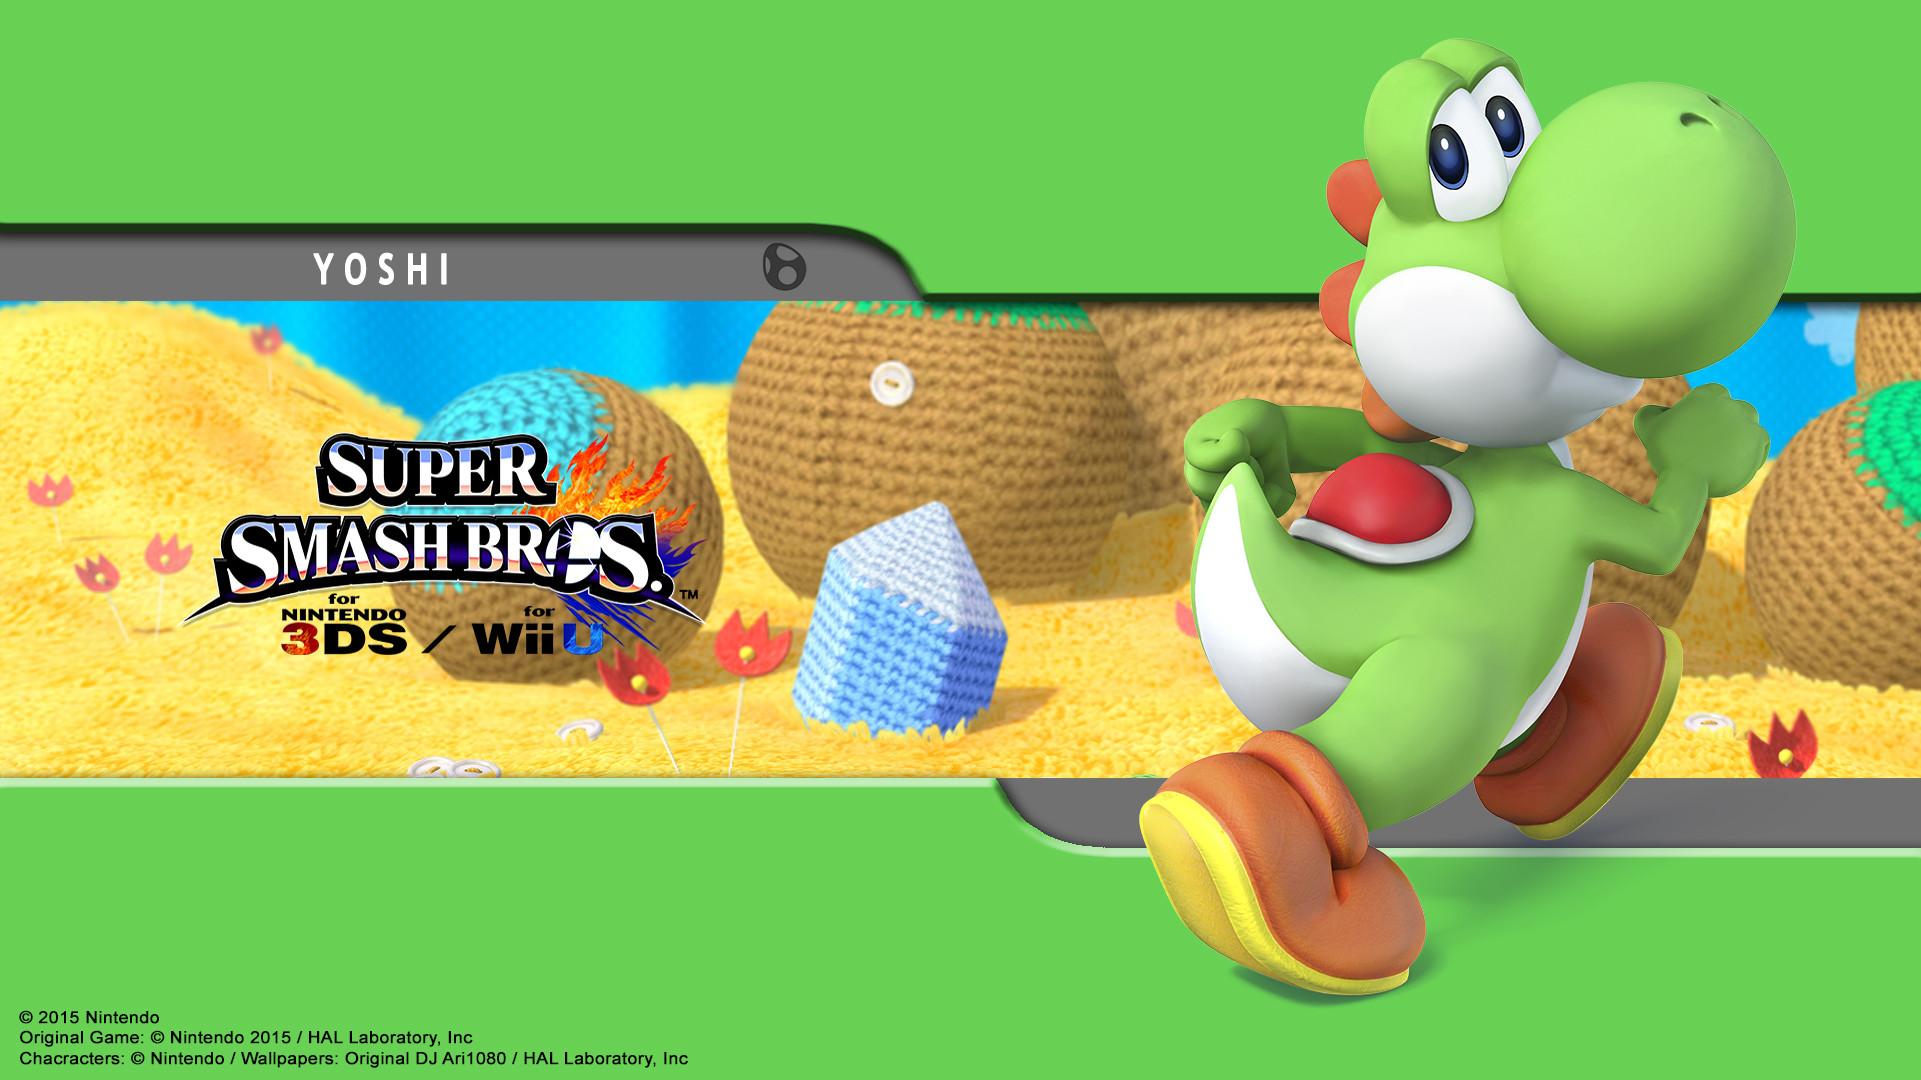 … Yoshi Wallpaper – SSB for 3Ds / Wii U by DJAri1080